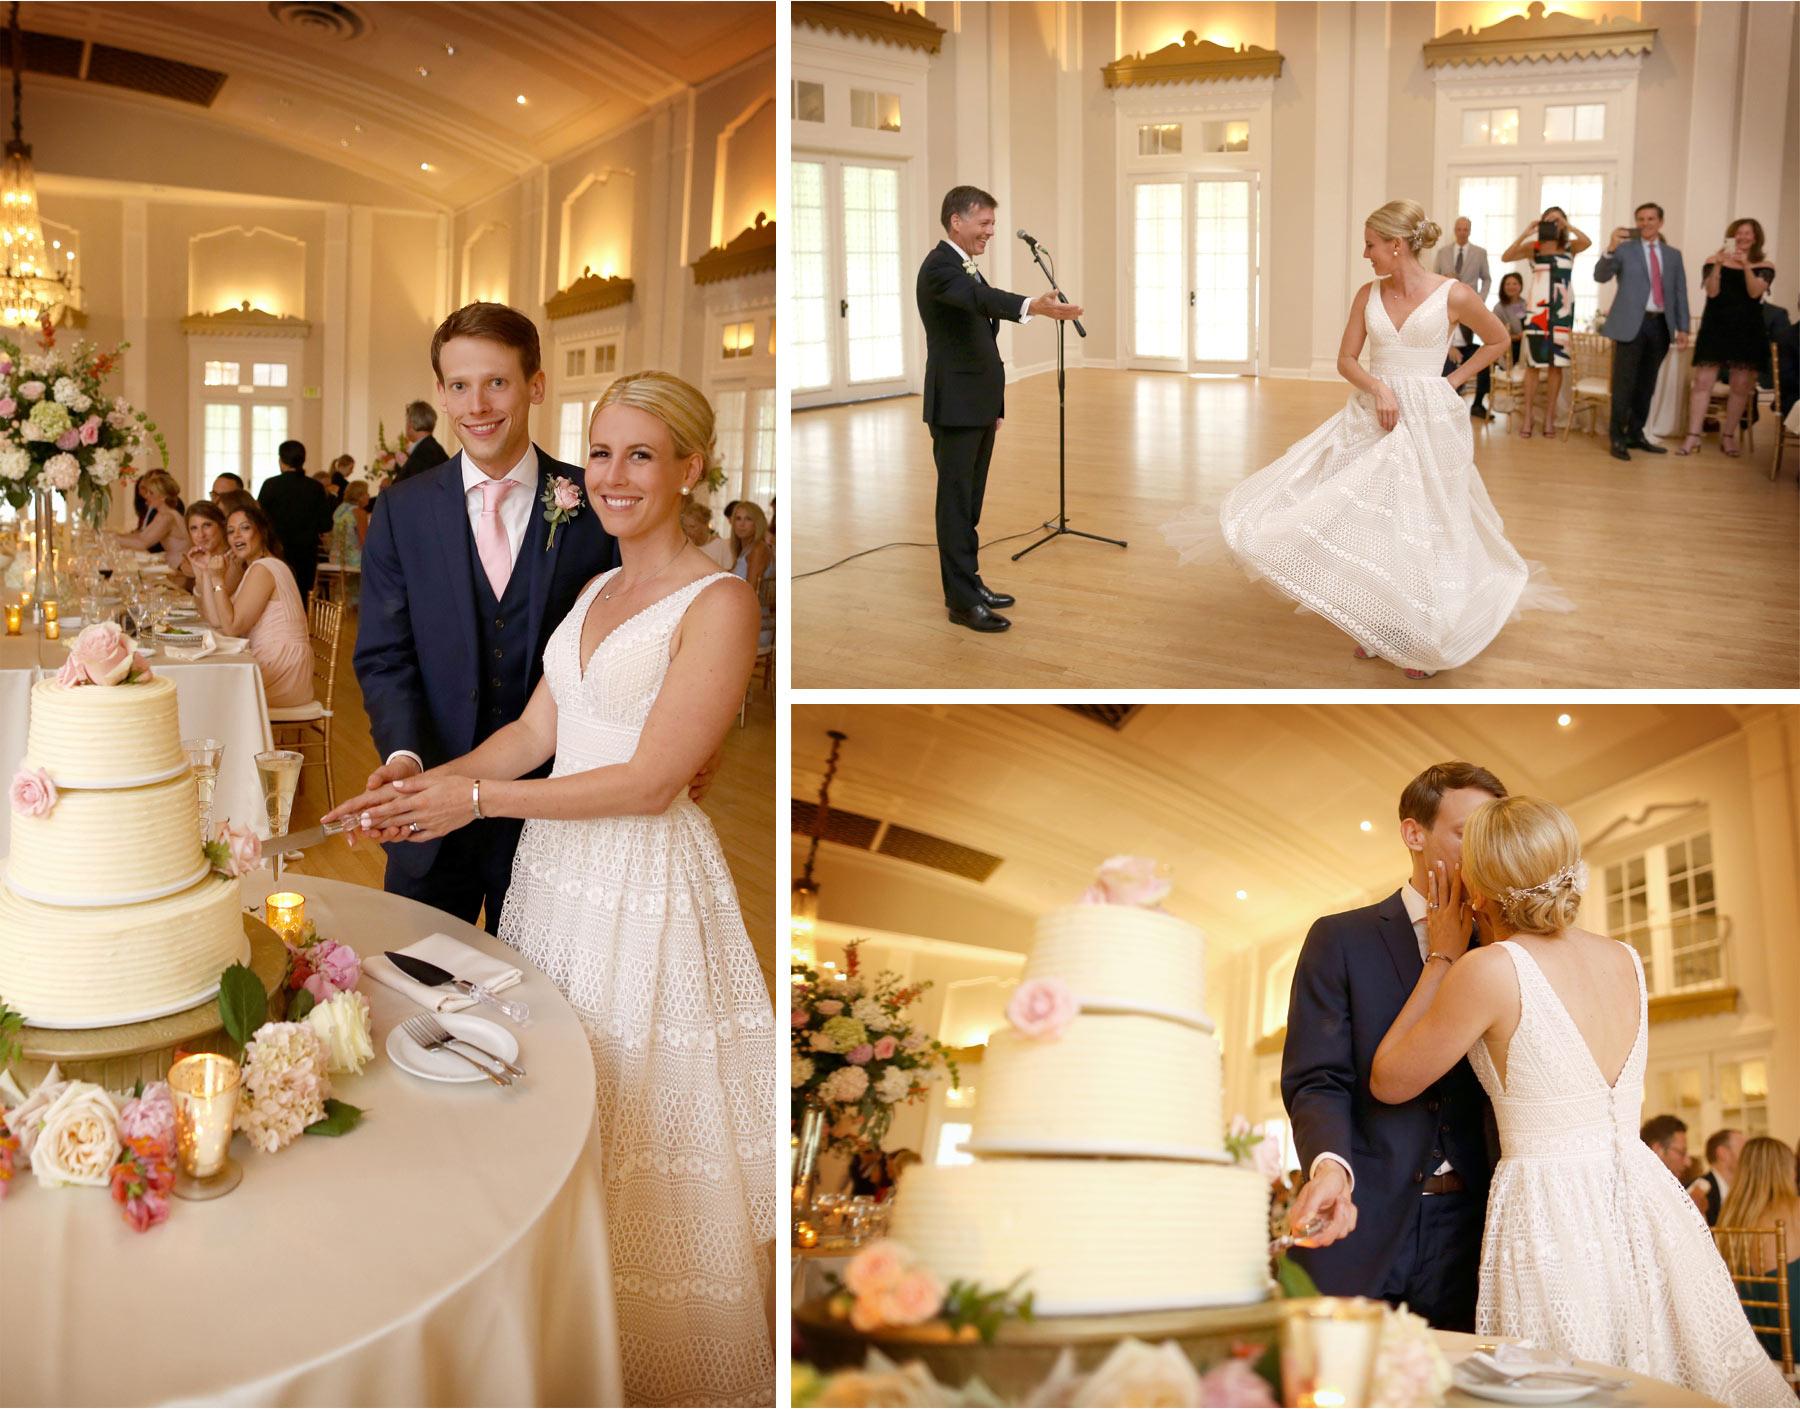 18-Minneapolis-Minnesota-Wedding-Photography-by-Vick-Photography-Lafayette-Club-Reception-Cake-Cutting-Maggie-and-Nicholas.jpg